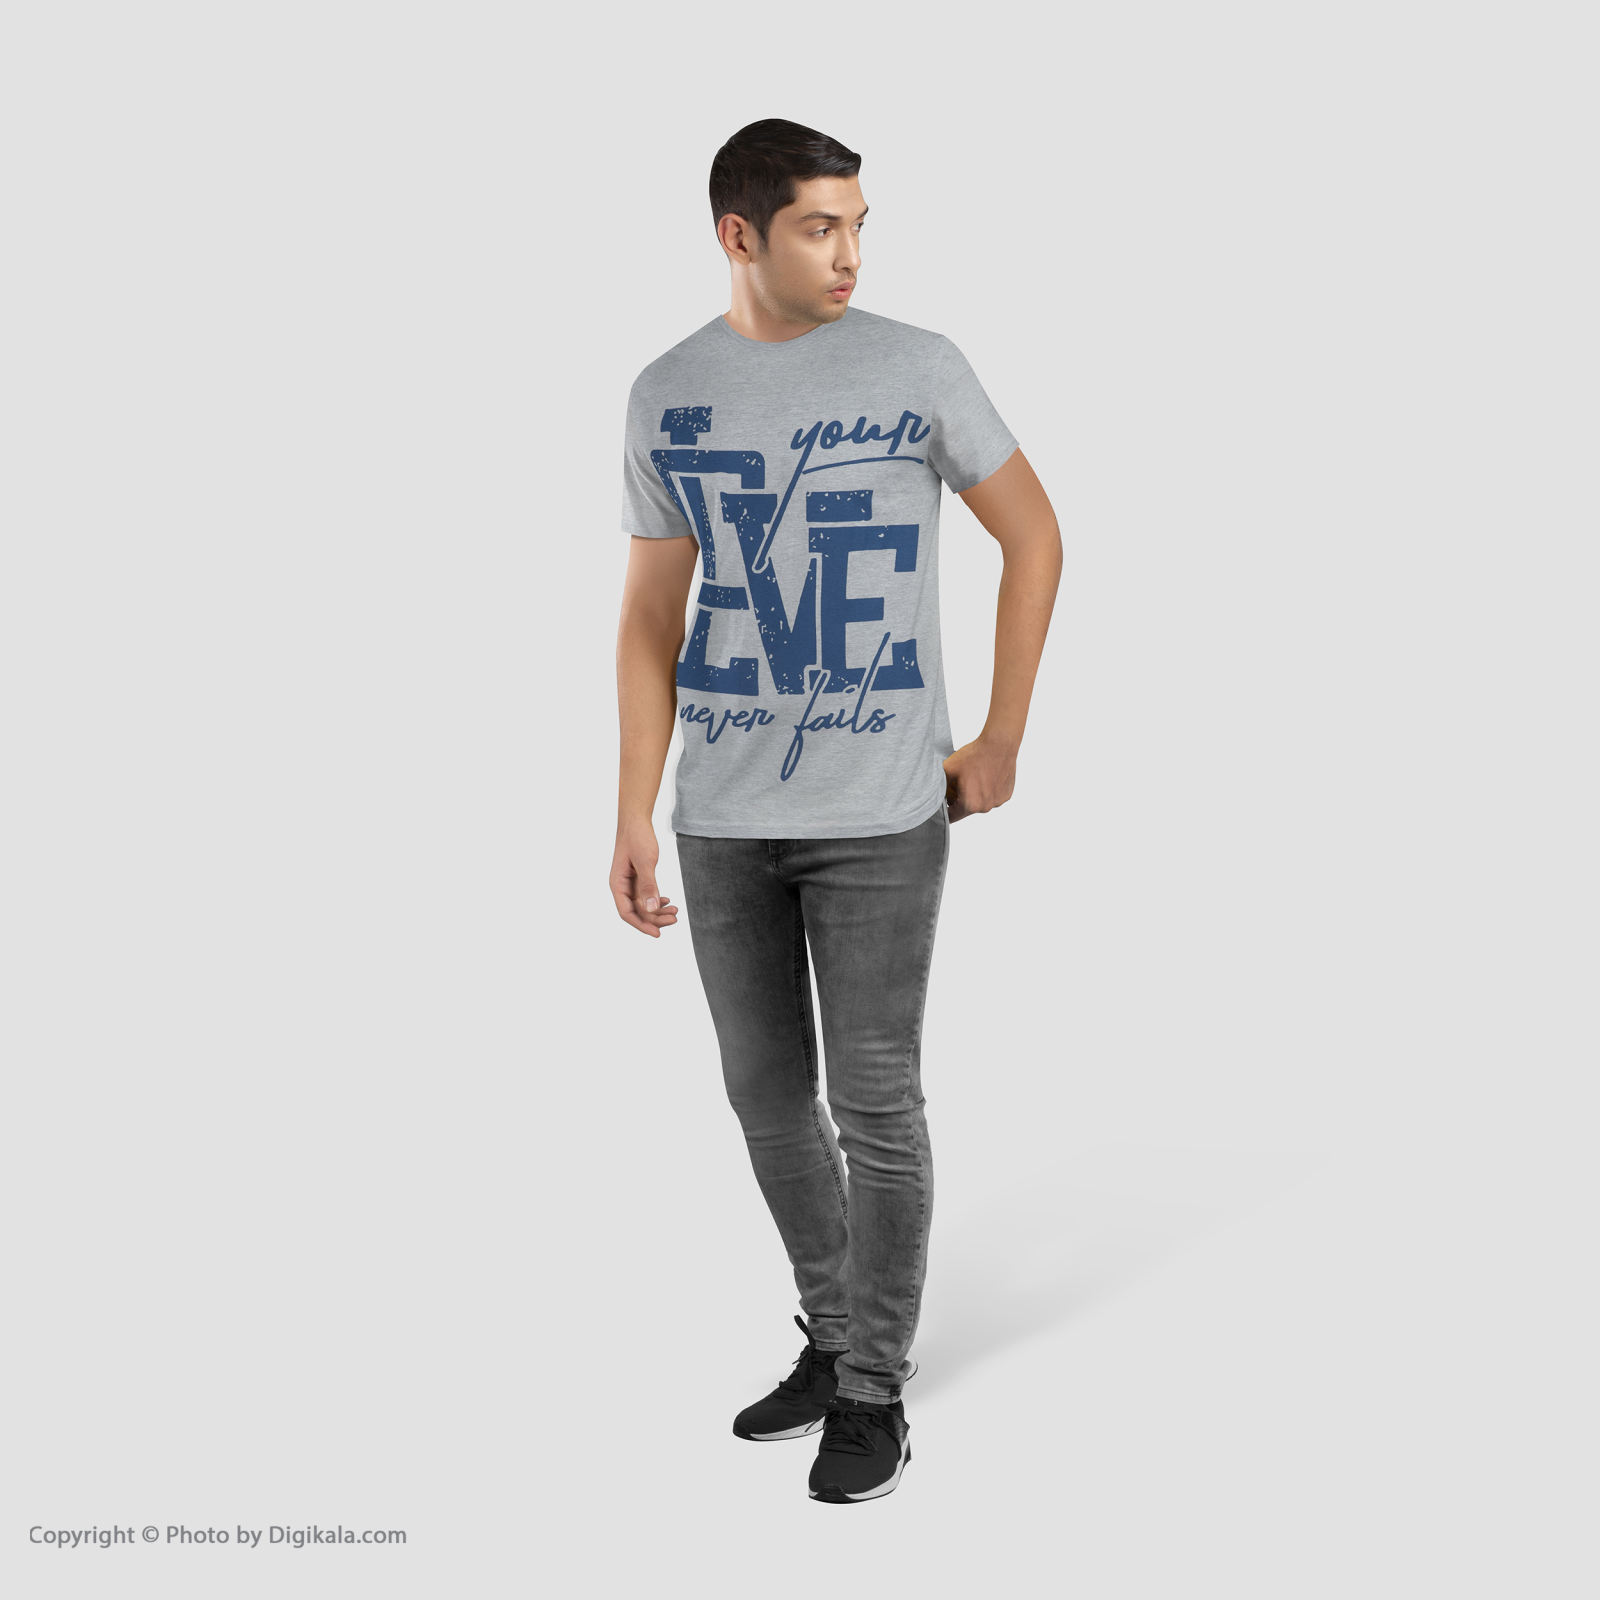 تیشرت مردانه آر اِن اِس مدل 12020956-93 -  - 9